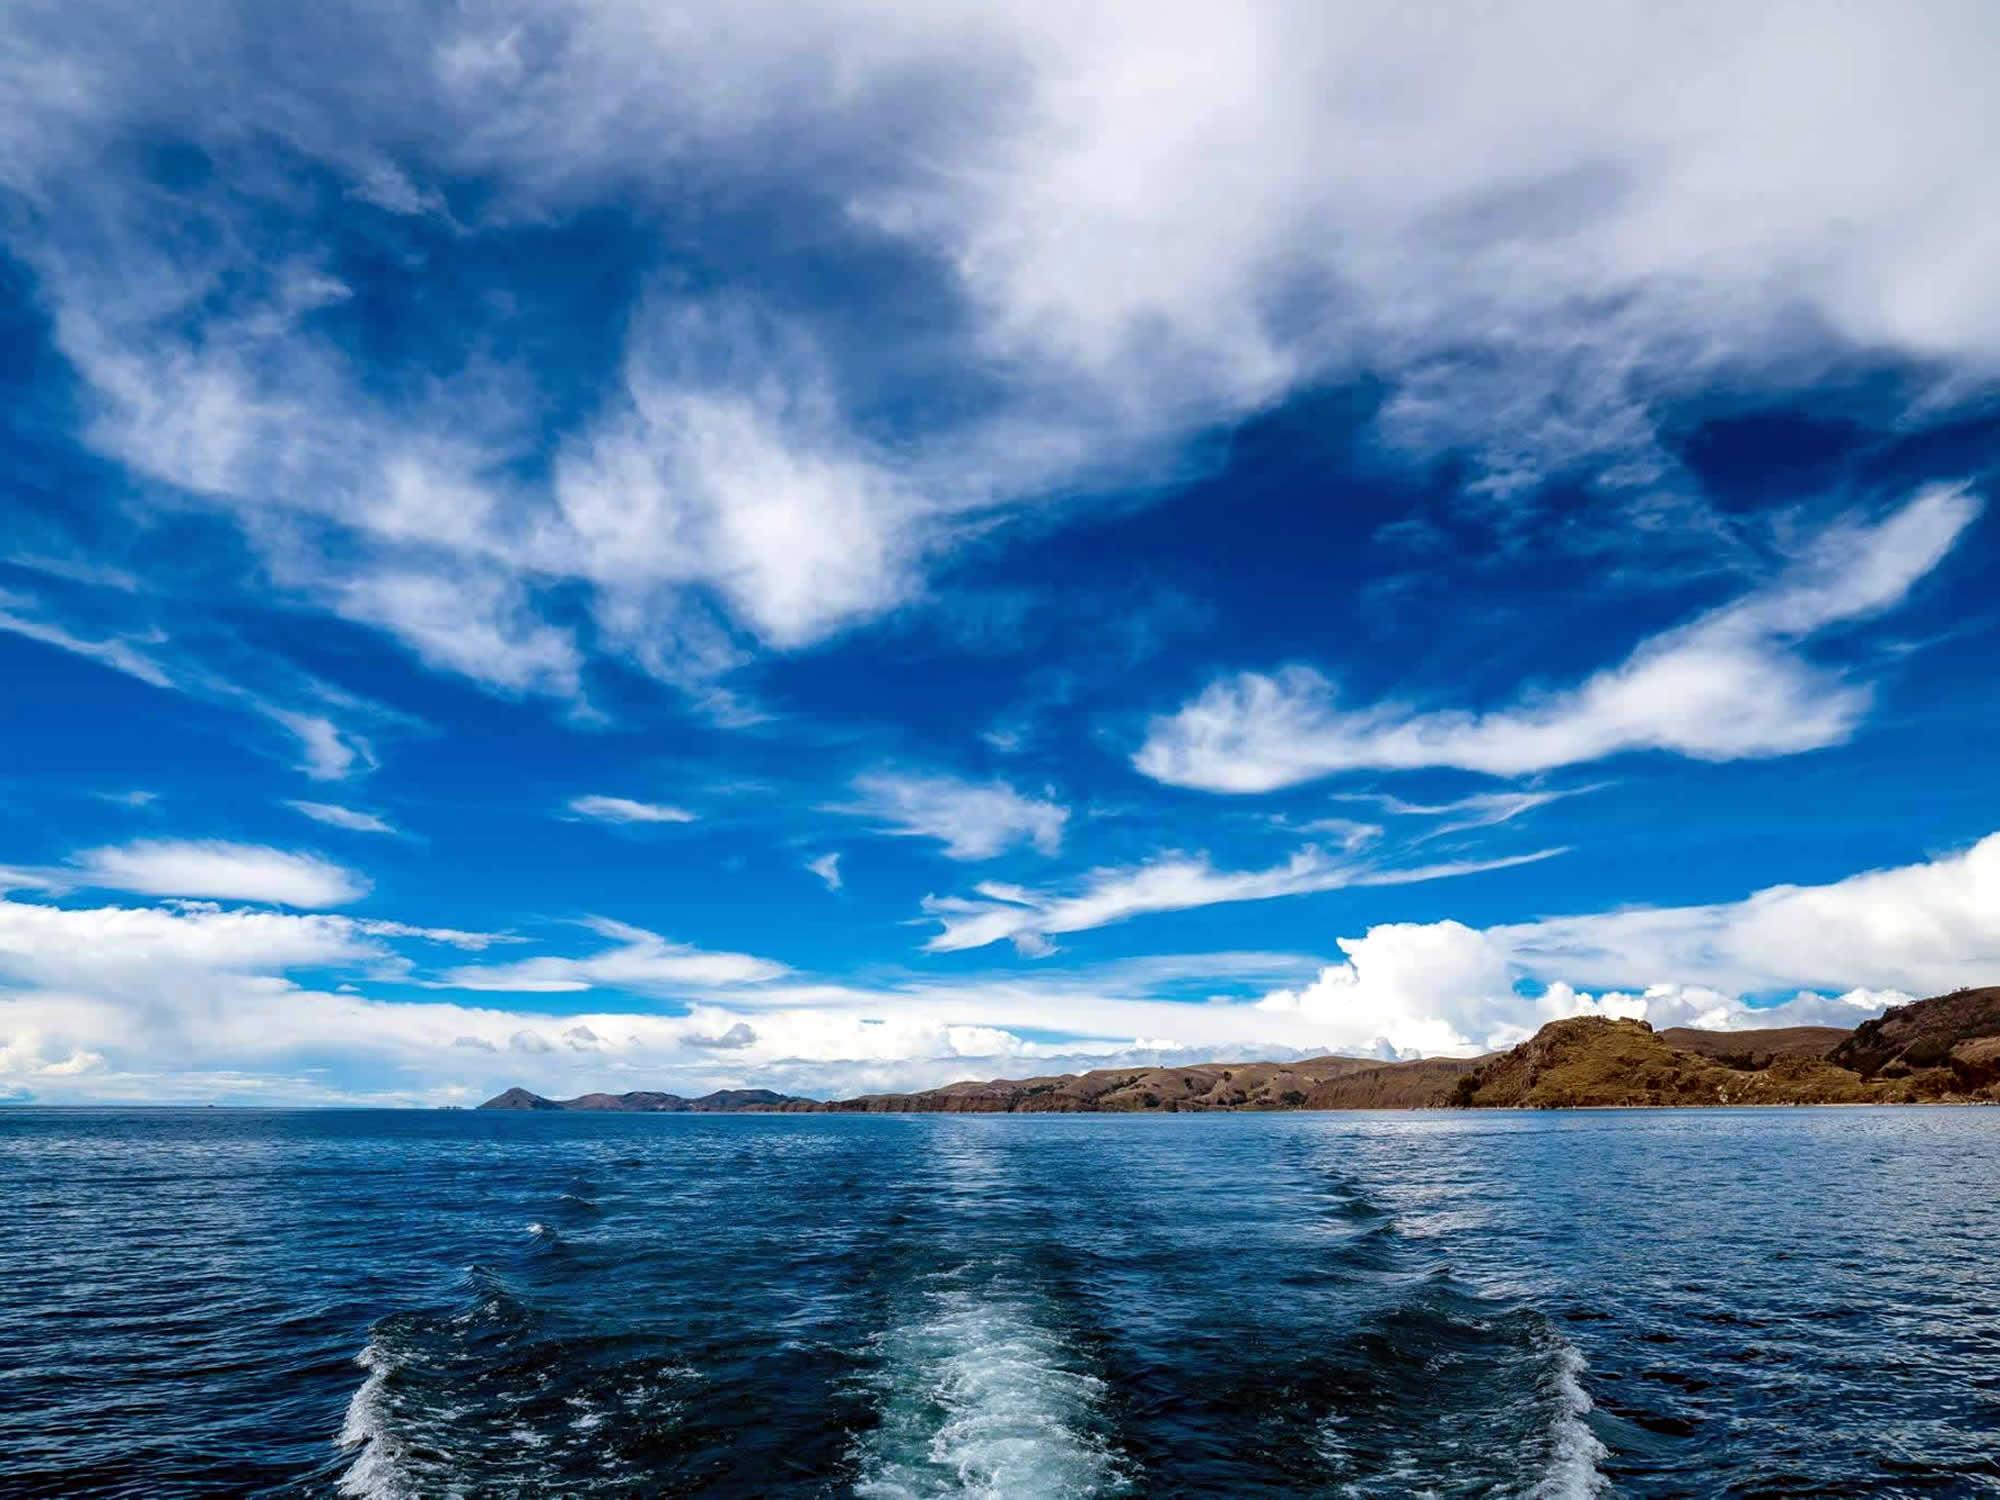 Titicaca Lake Catamaran Tour - La Paz - Sun Island - La Paz, La Paz